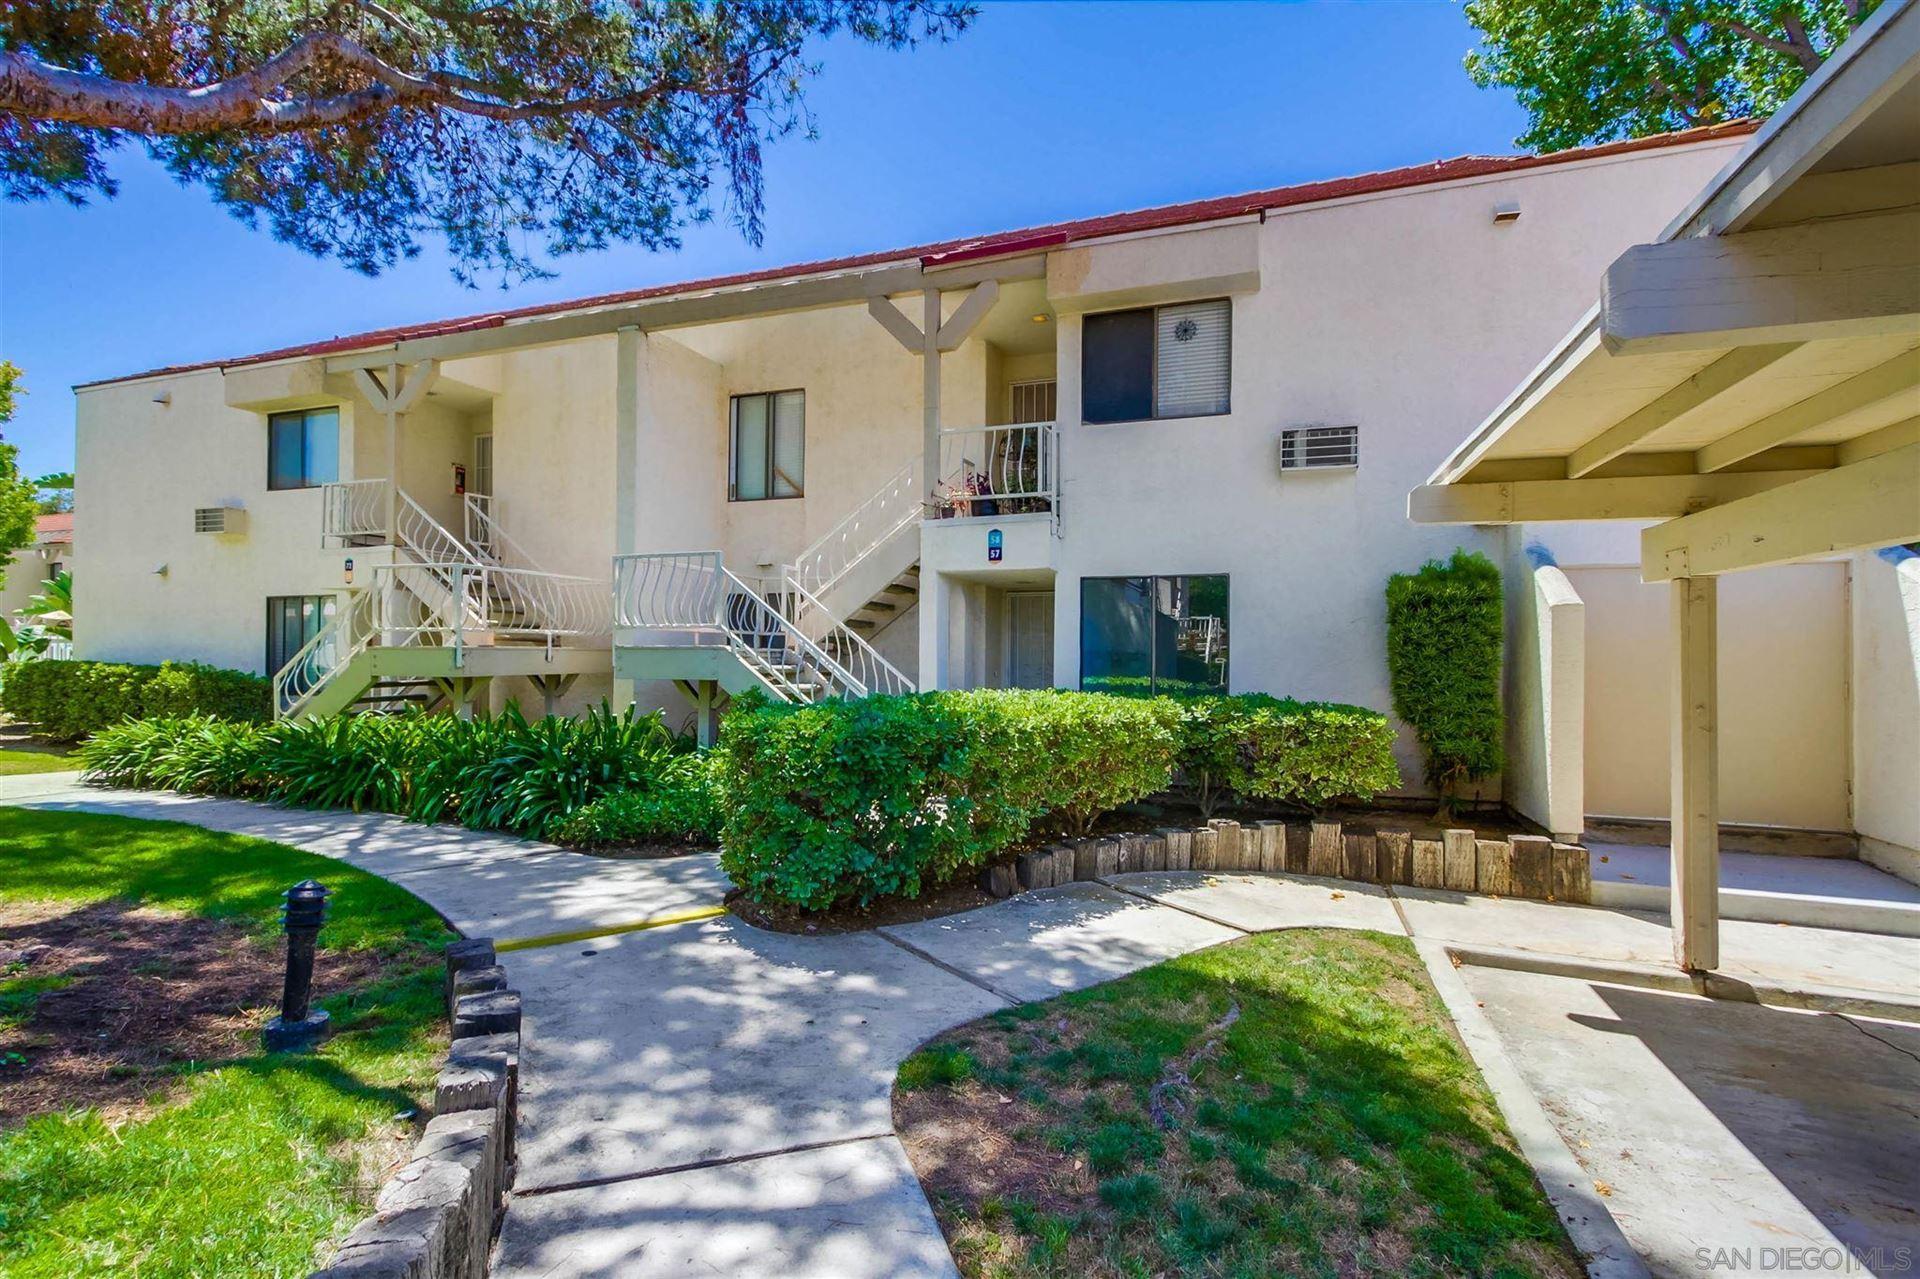 Photo of 10845 Camino Ruiz #57, San Diego, CA 92126 (MLS # 210021627)